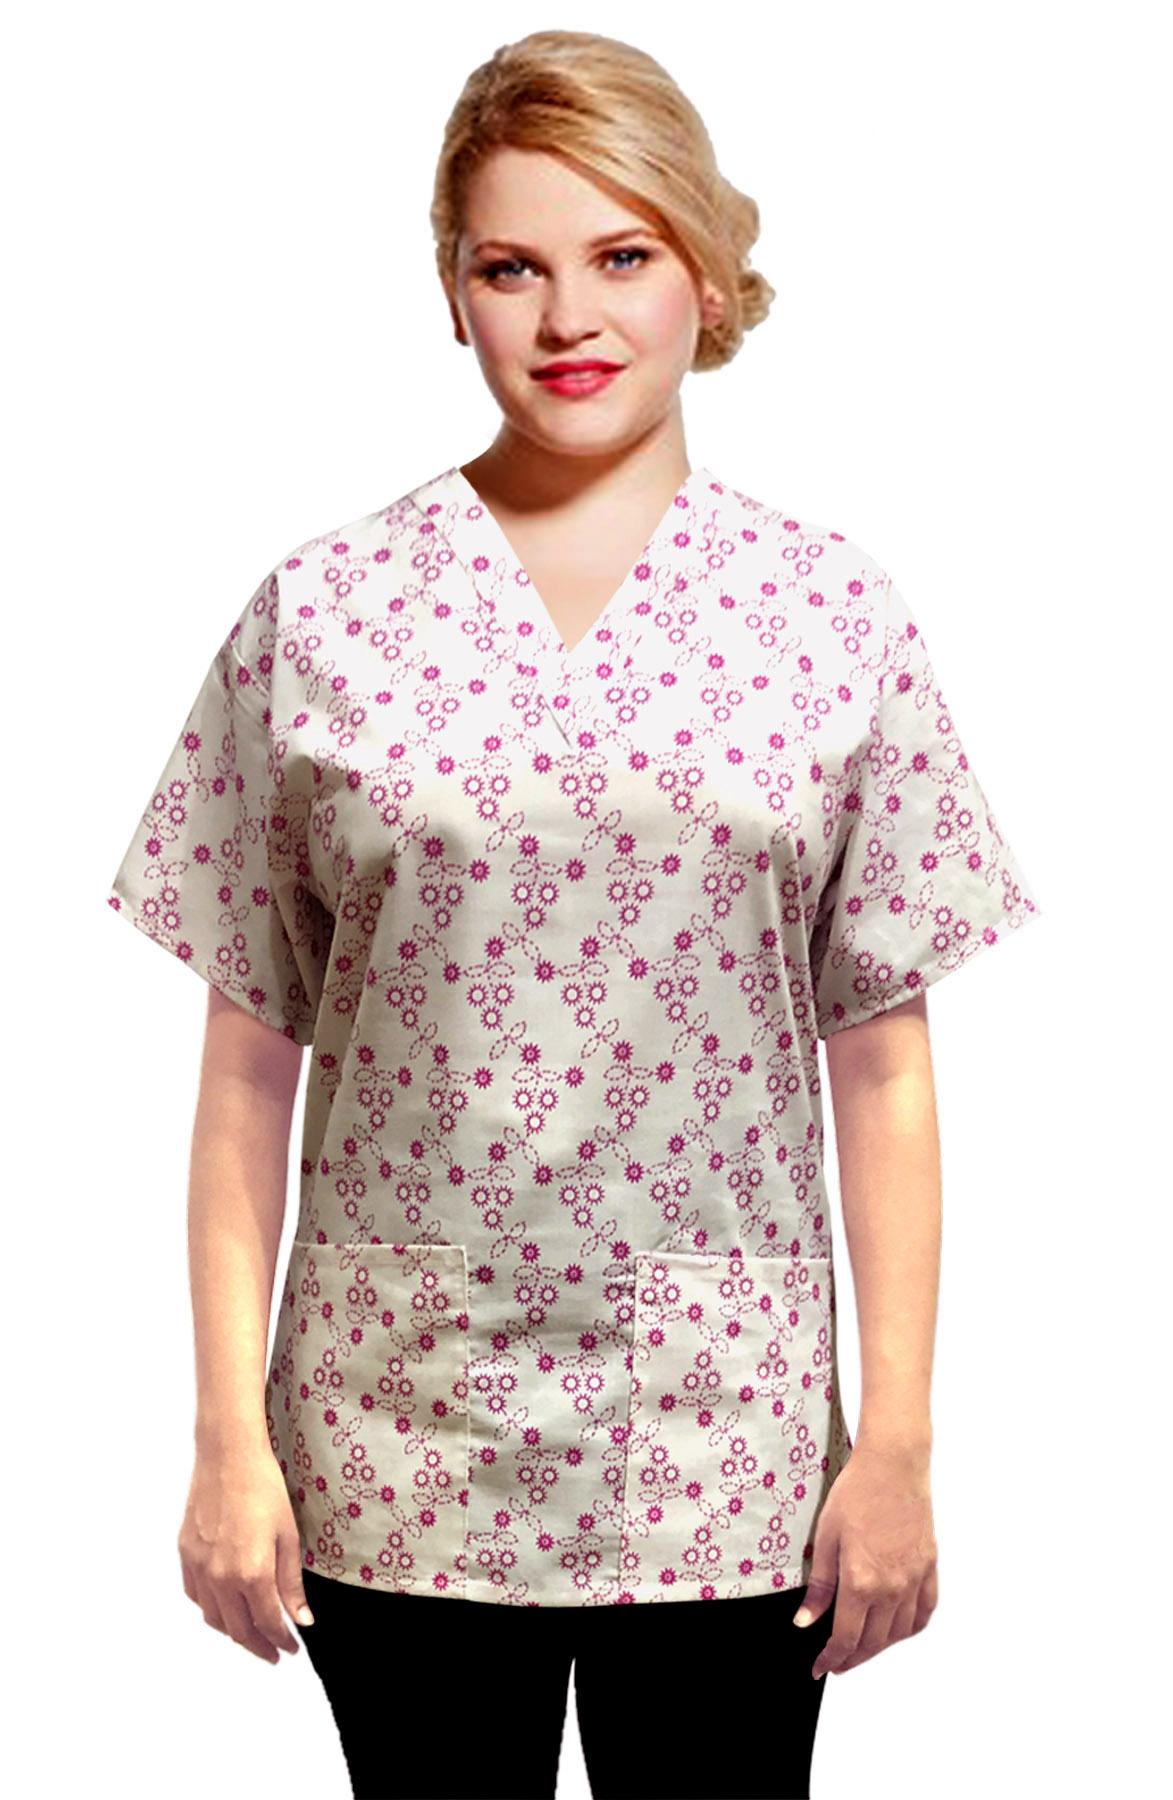 Printed scrub set 4 pocket ladies half sleeve Small Pink flower Print (2 pocket top and 2 pocket pant)